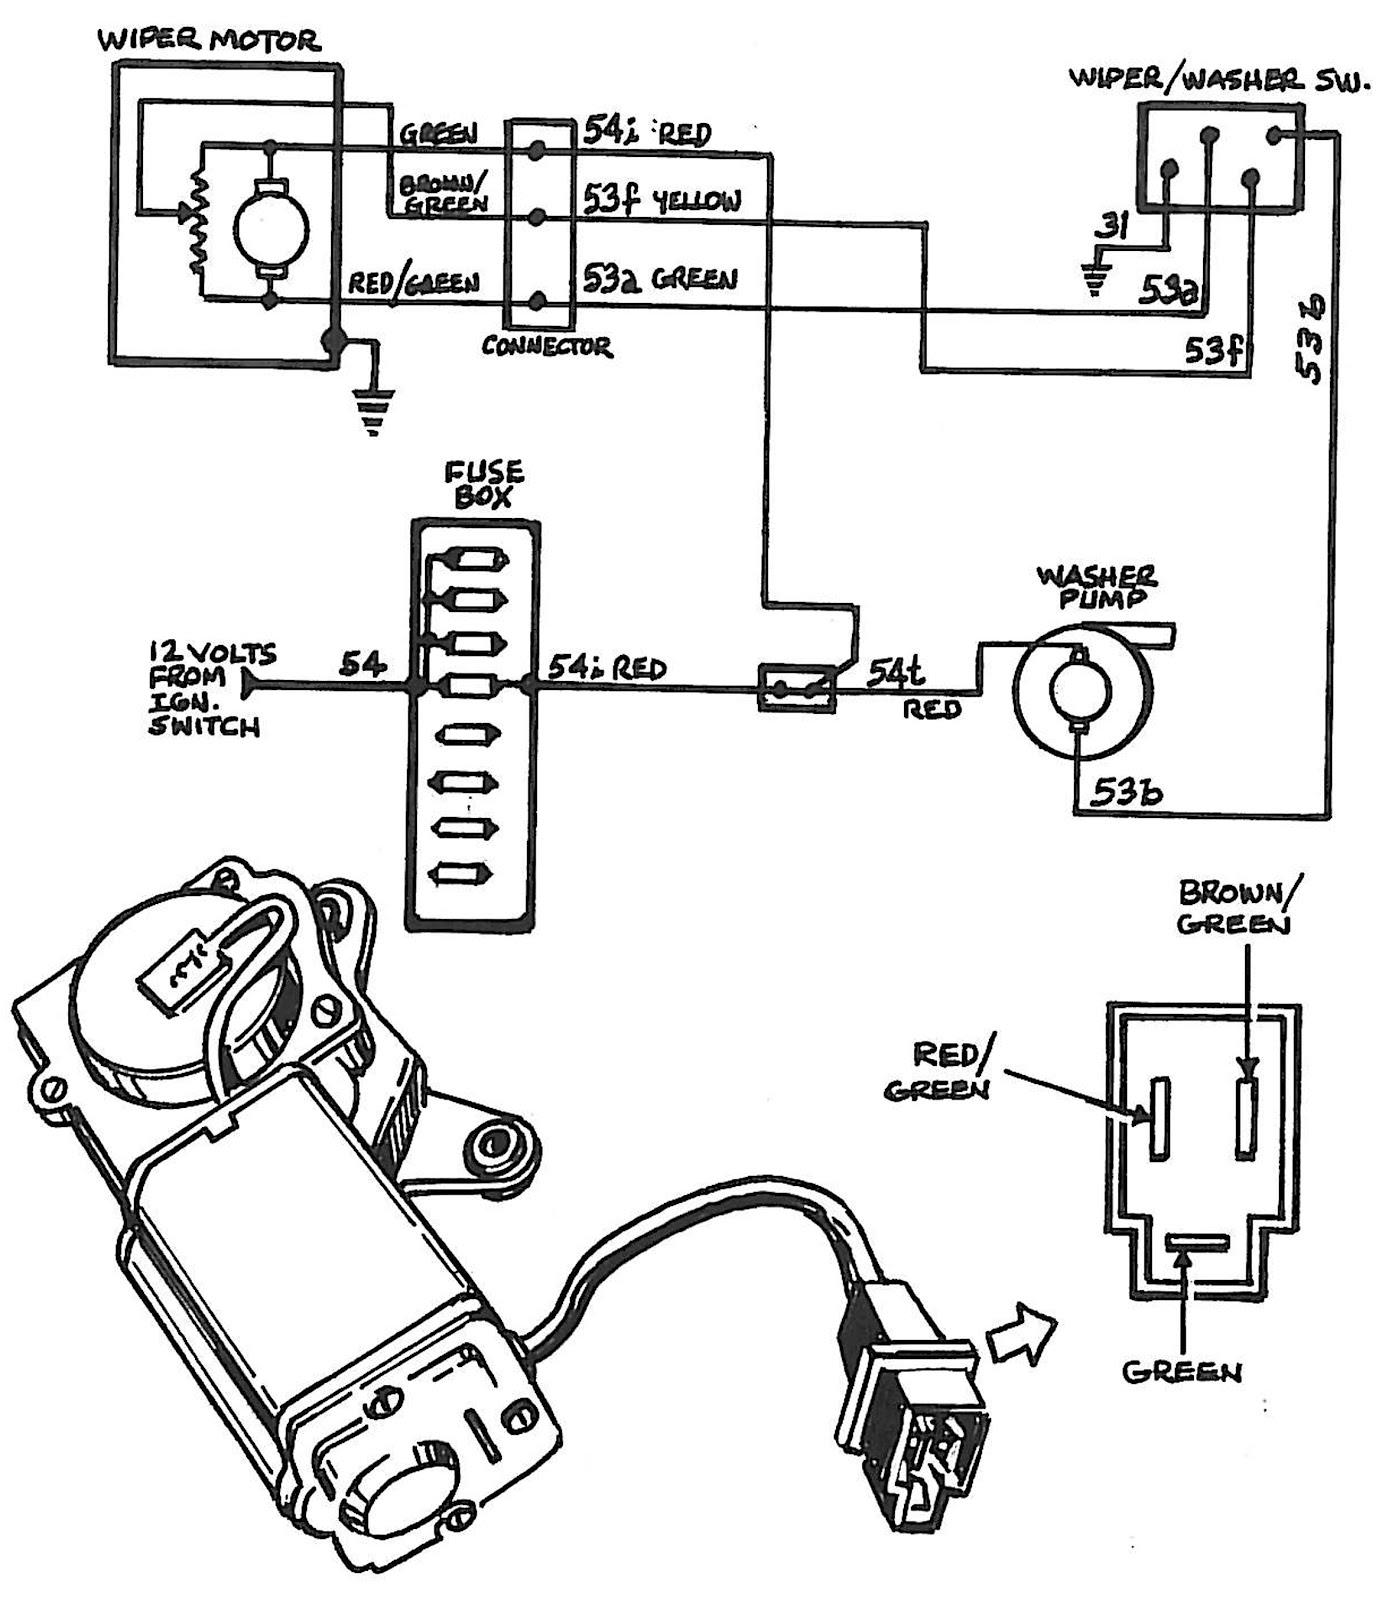 2003 chevy suburban rear wiper motor wiring diagram image details